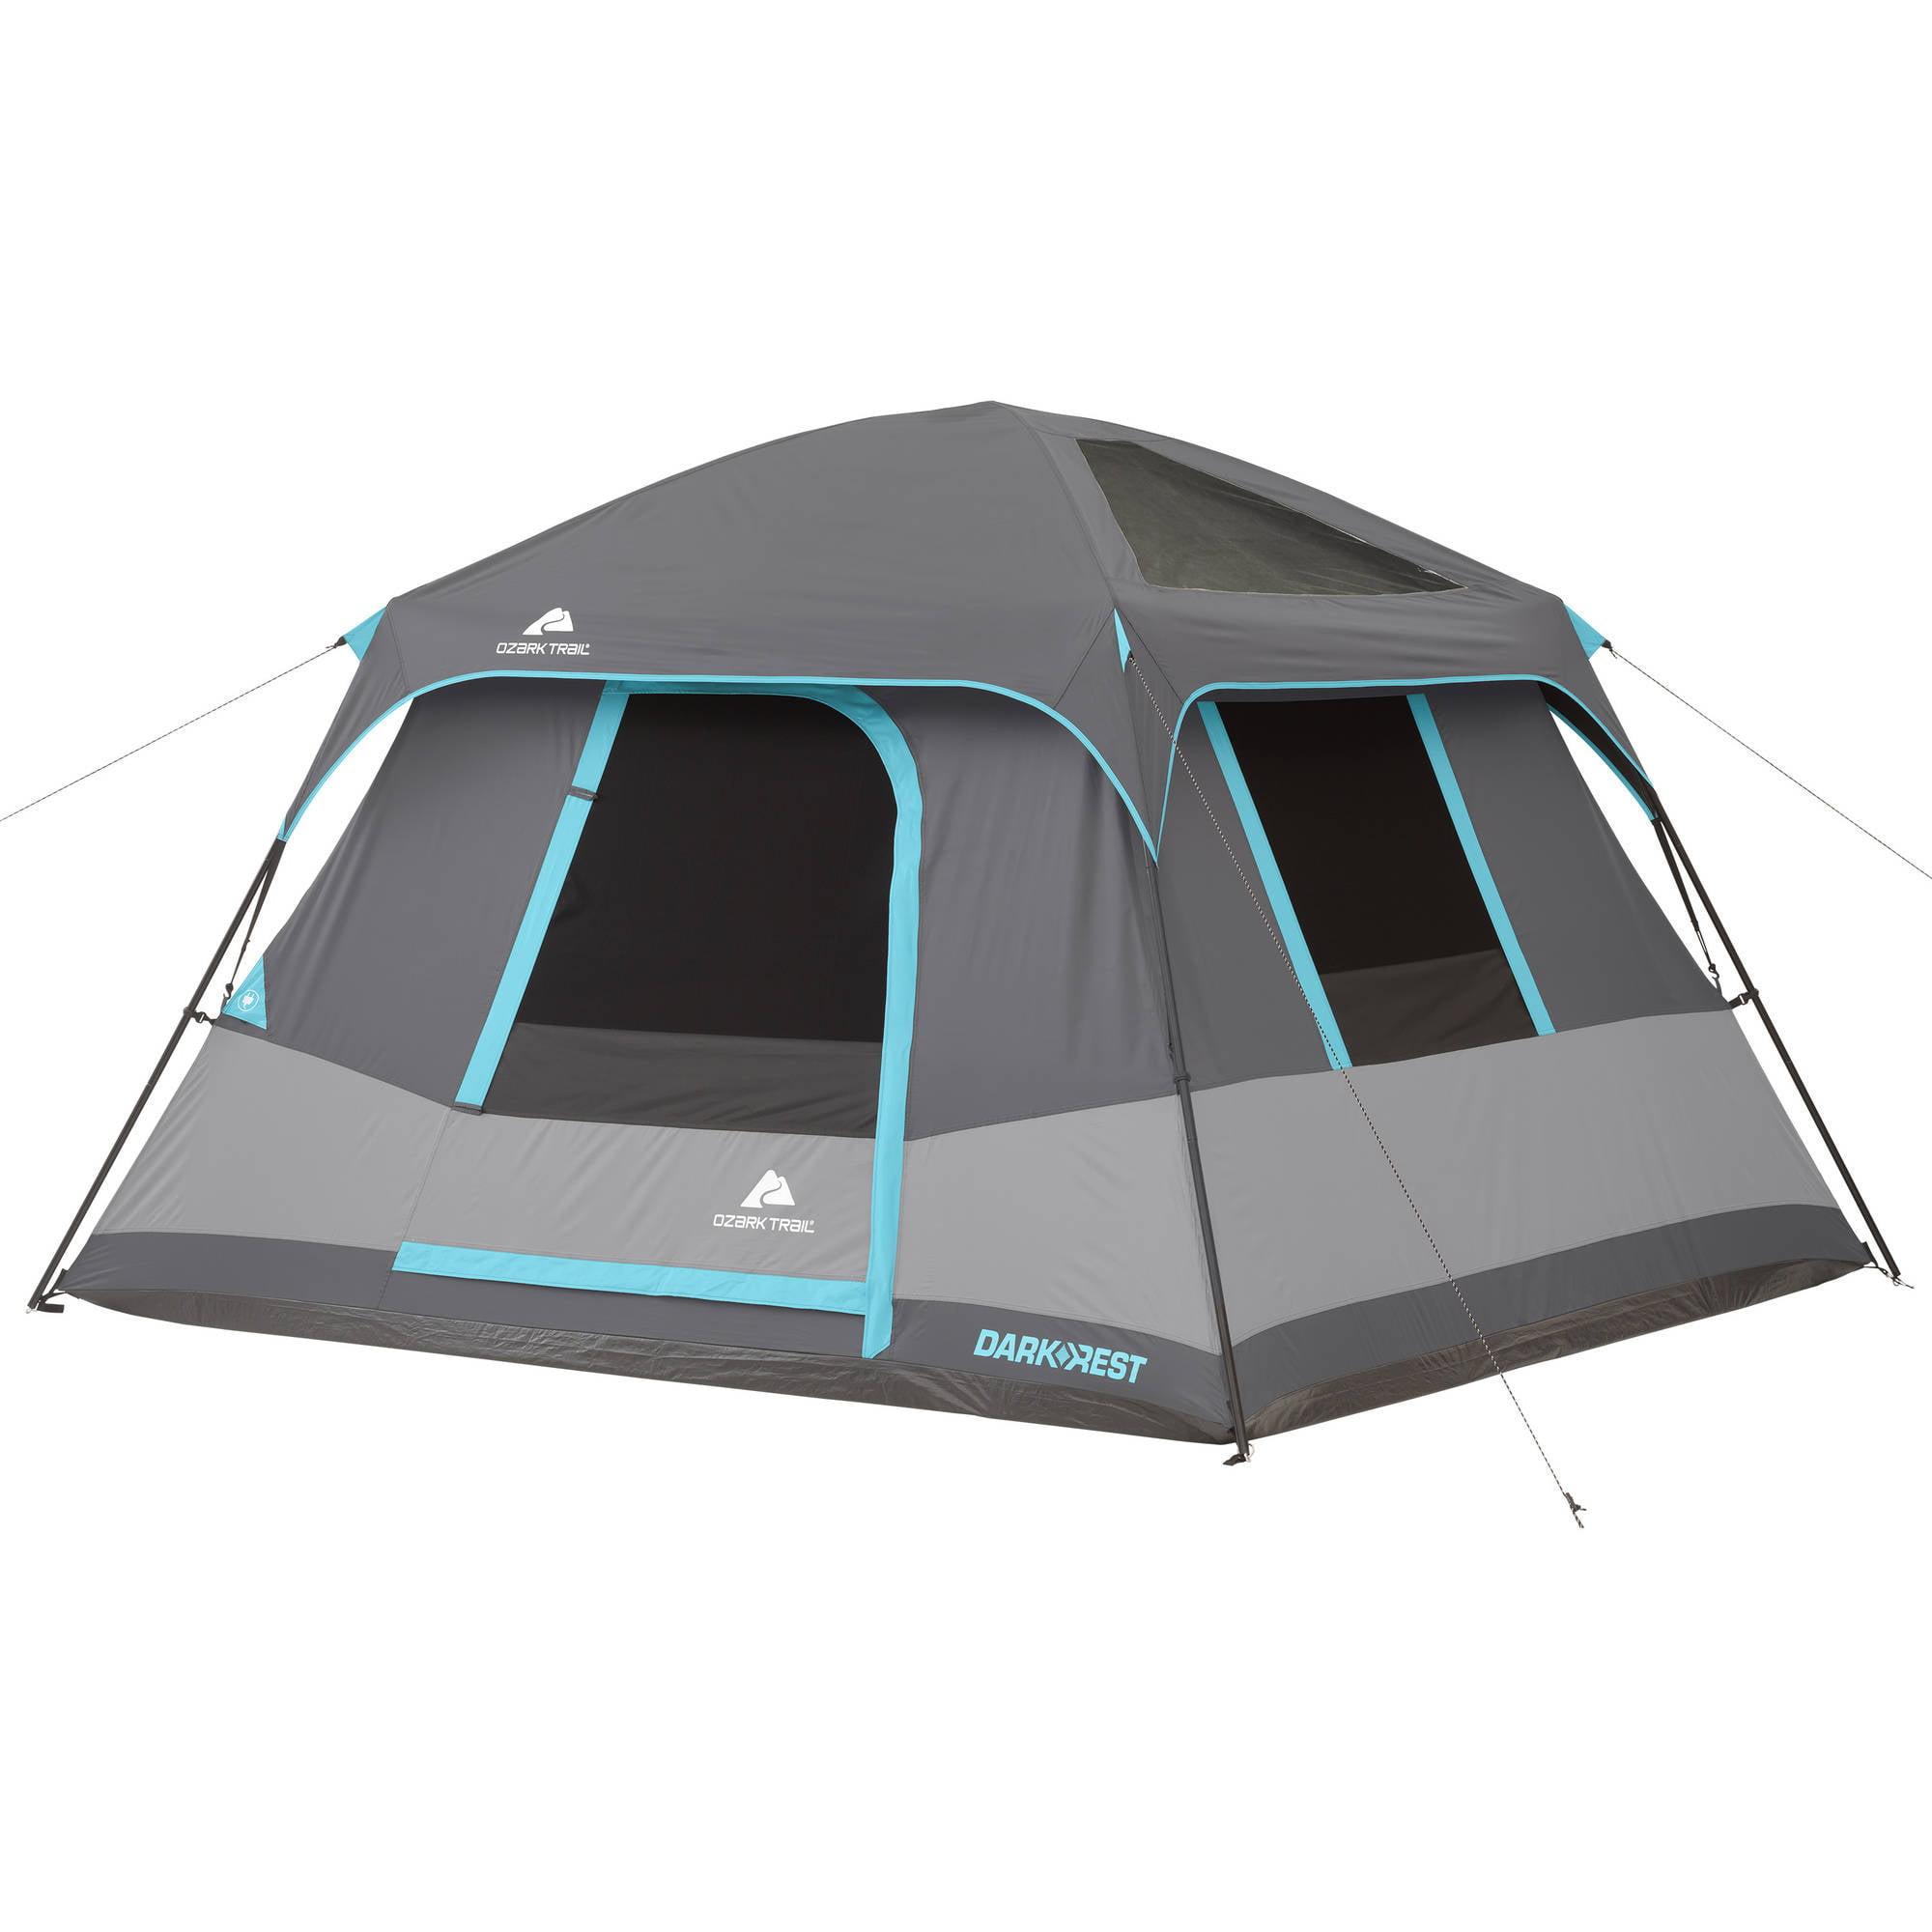 Ozark Trail 10' x 9' Dark Rest Frp Cabin Tent, Sleeps 6 by Bohemian Travel Gear Limited